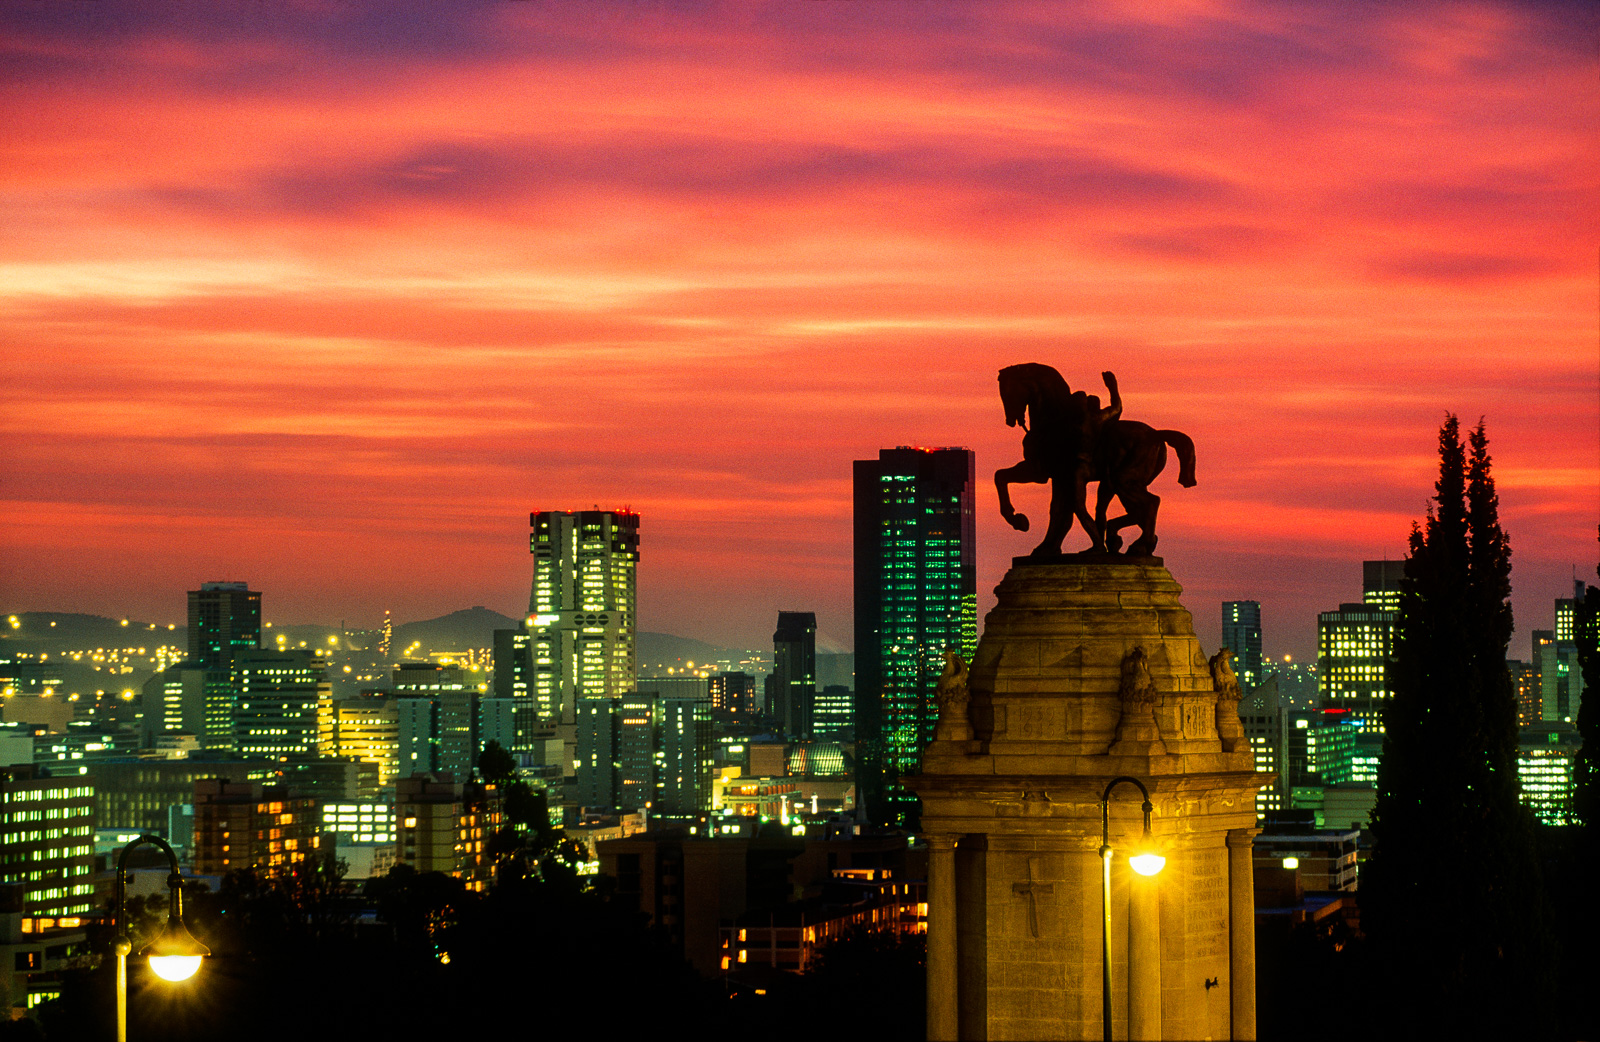 Photograph of sunset over Pretoria, South Africa